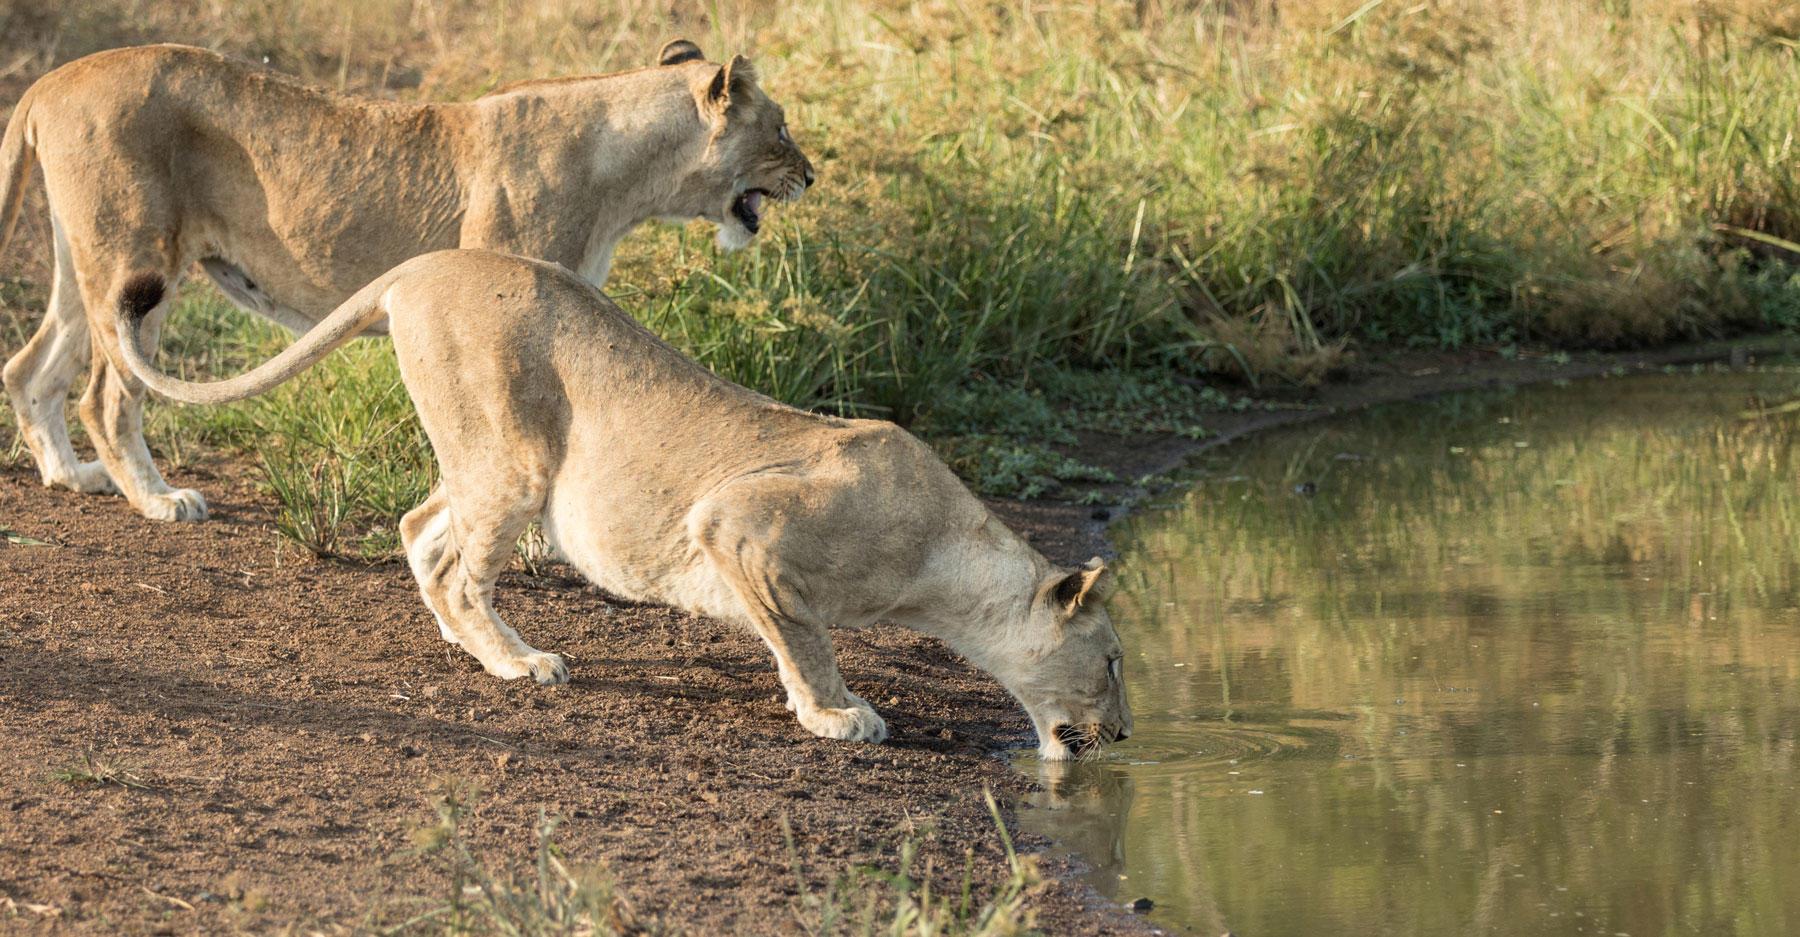 Lions released into Rwanda